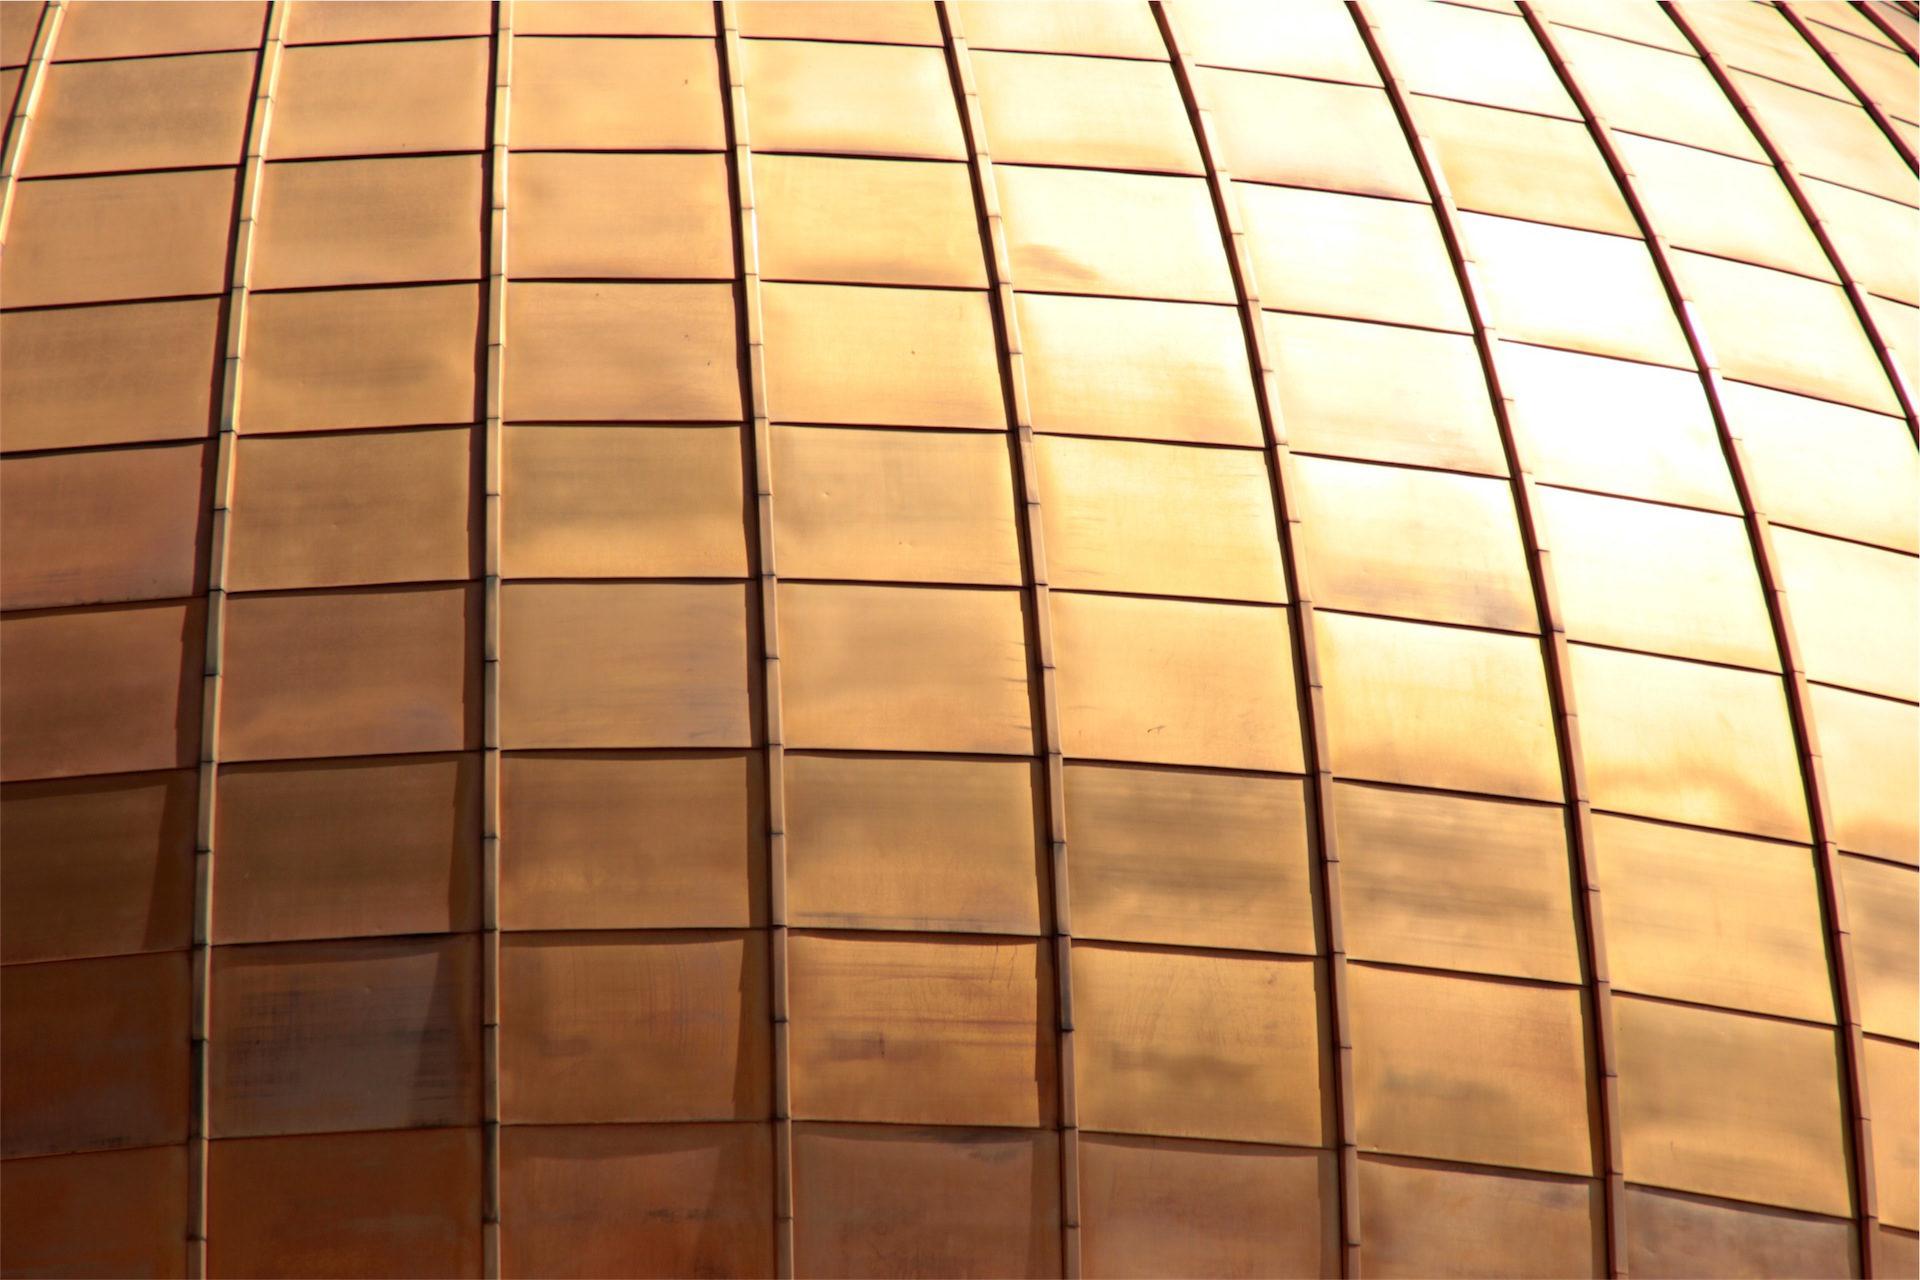 Gebäude, Dorado, Teile, Platz, Reflexion - Wallpaper HD - Prof.-falken.com